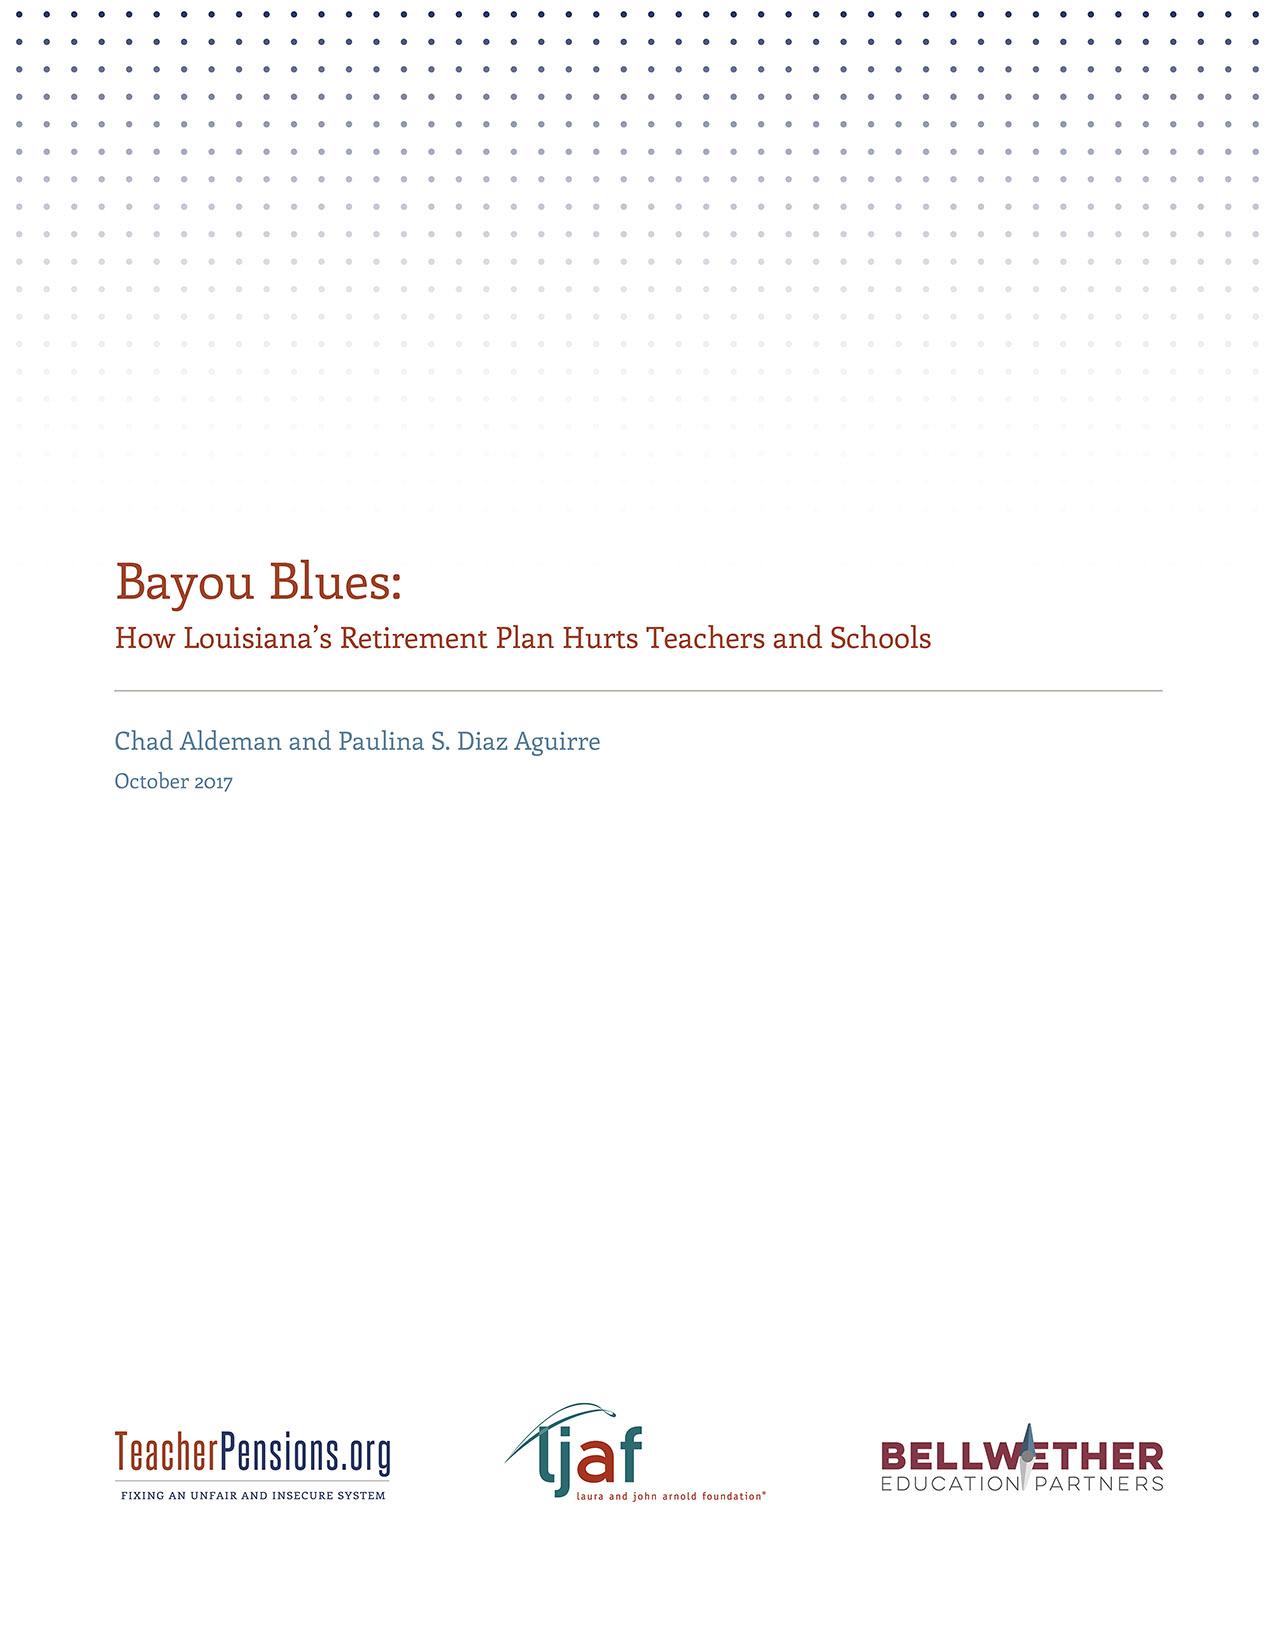 Bayou Blue cover image